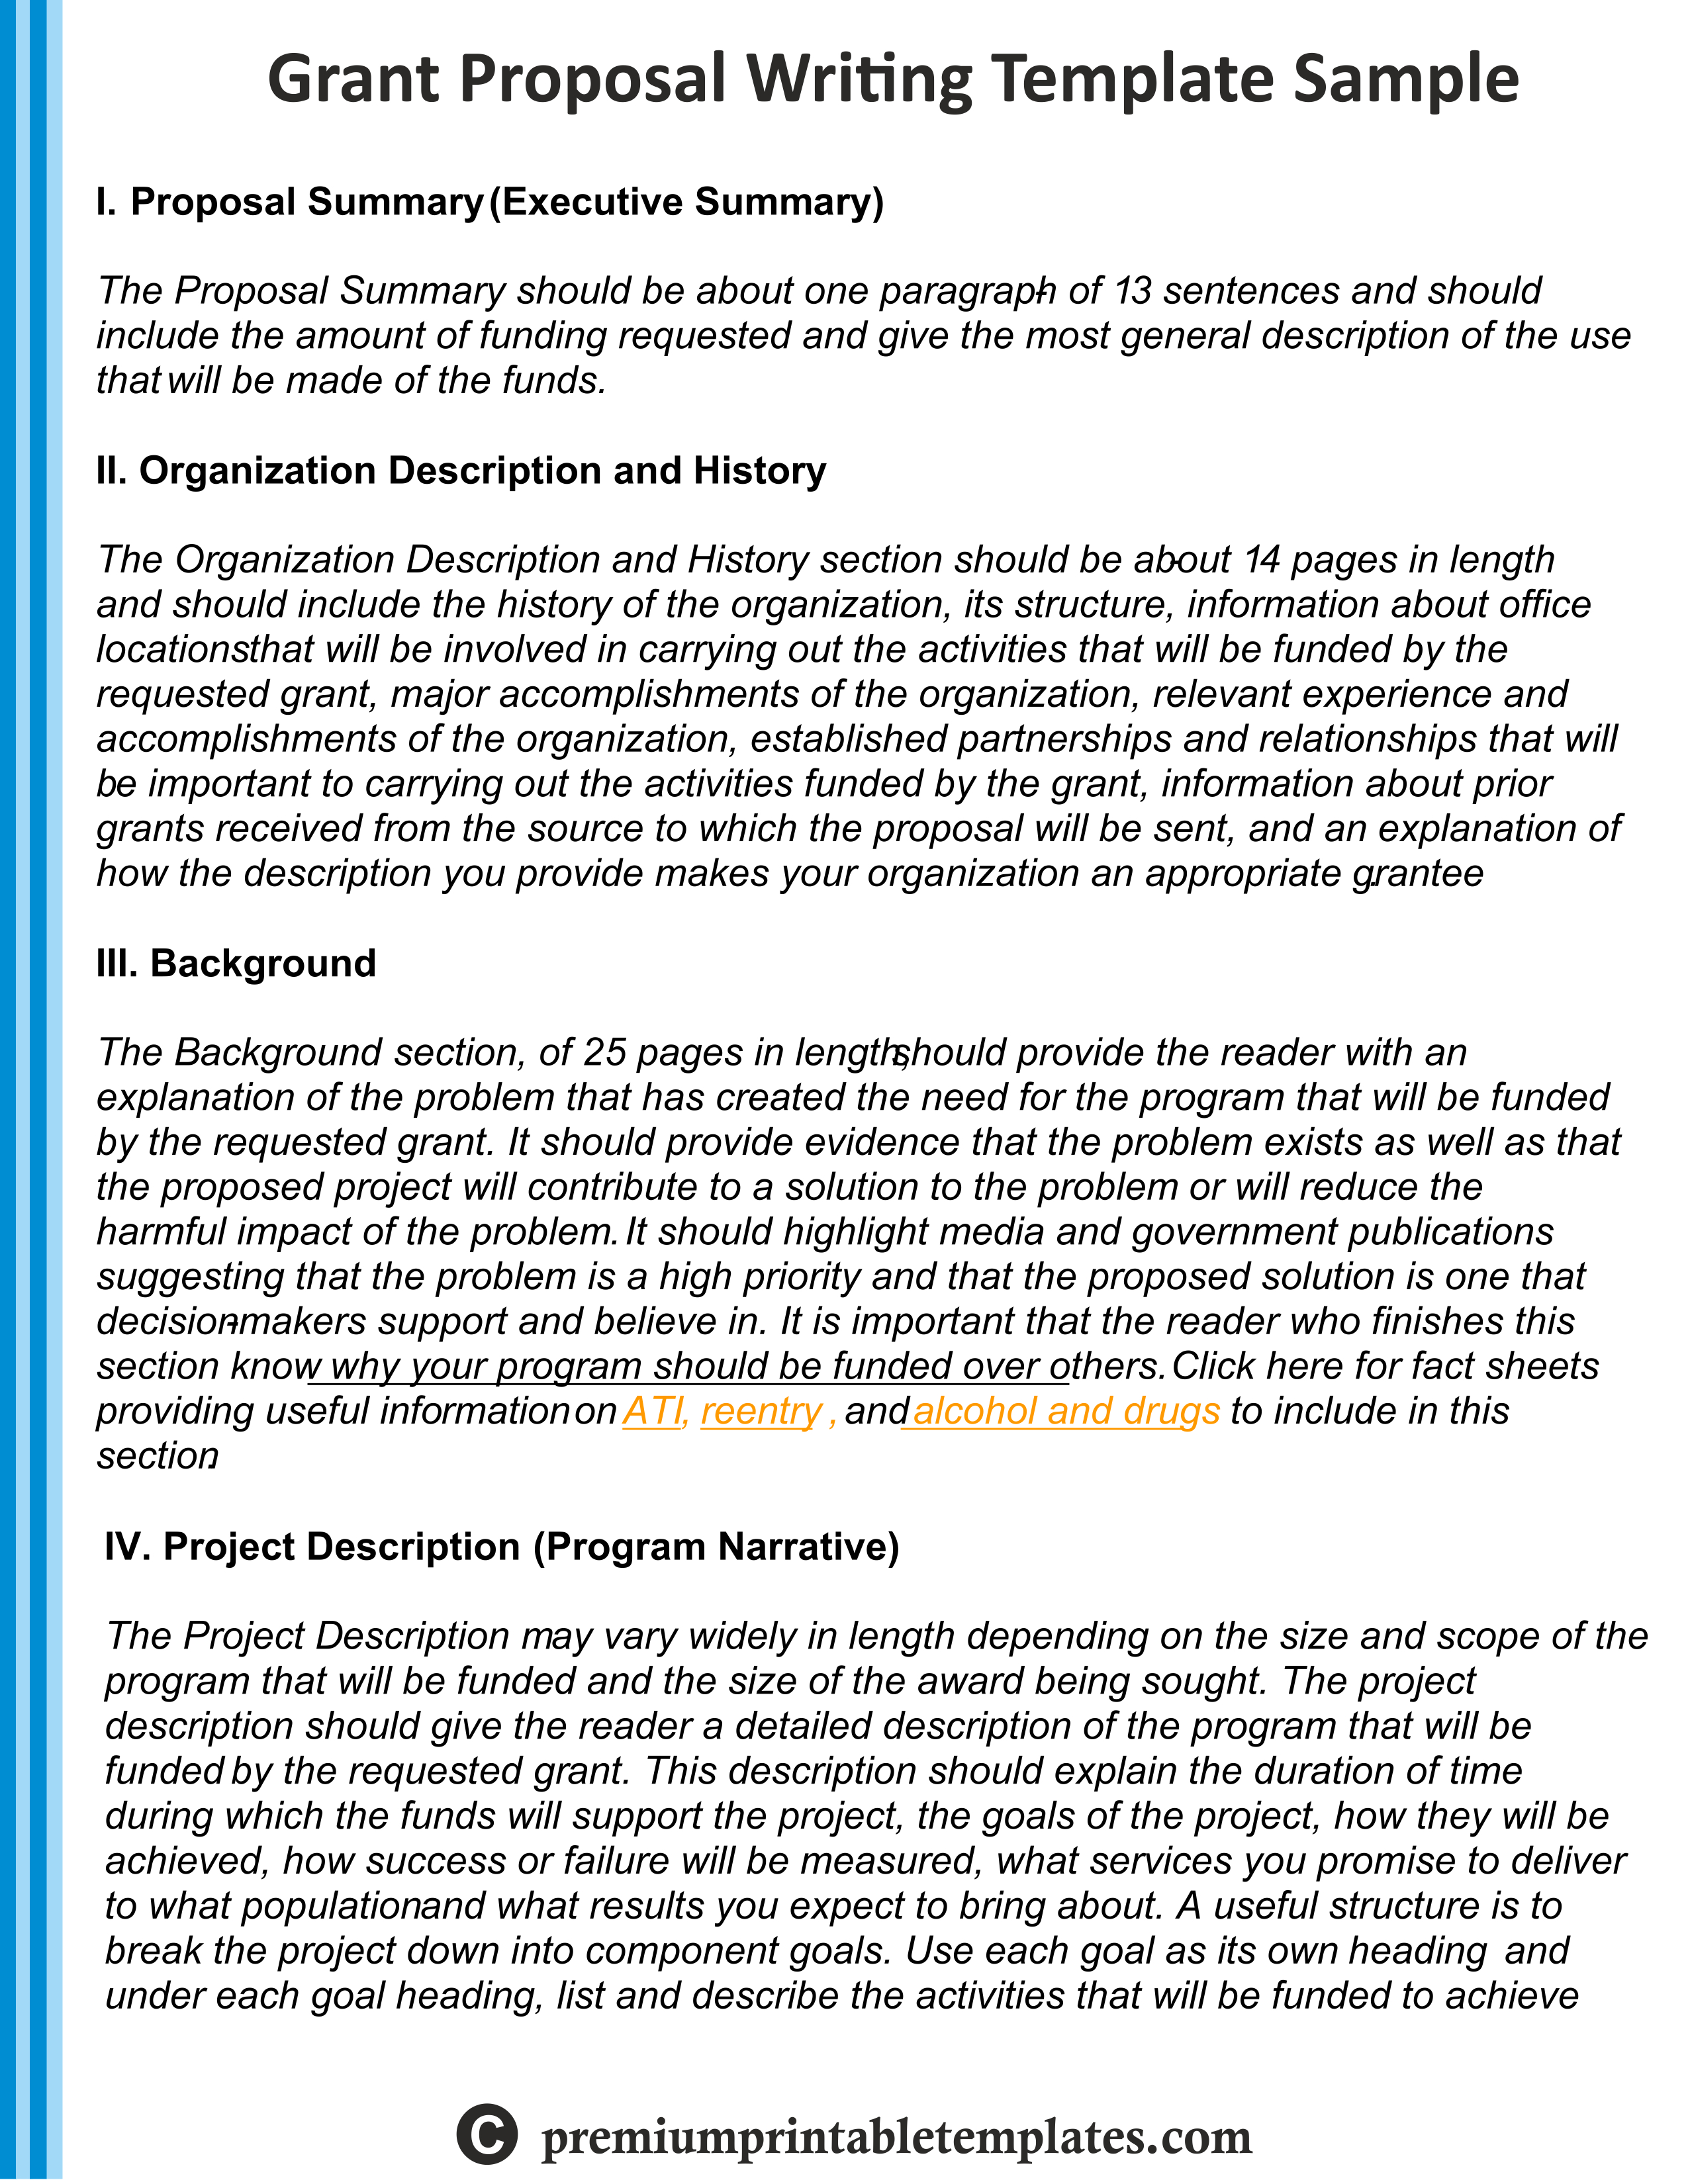 Grant Writing Proposal Sample Template  Grant Writing Proposal For Writing A Grant Proposal Template